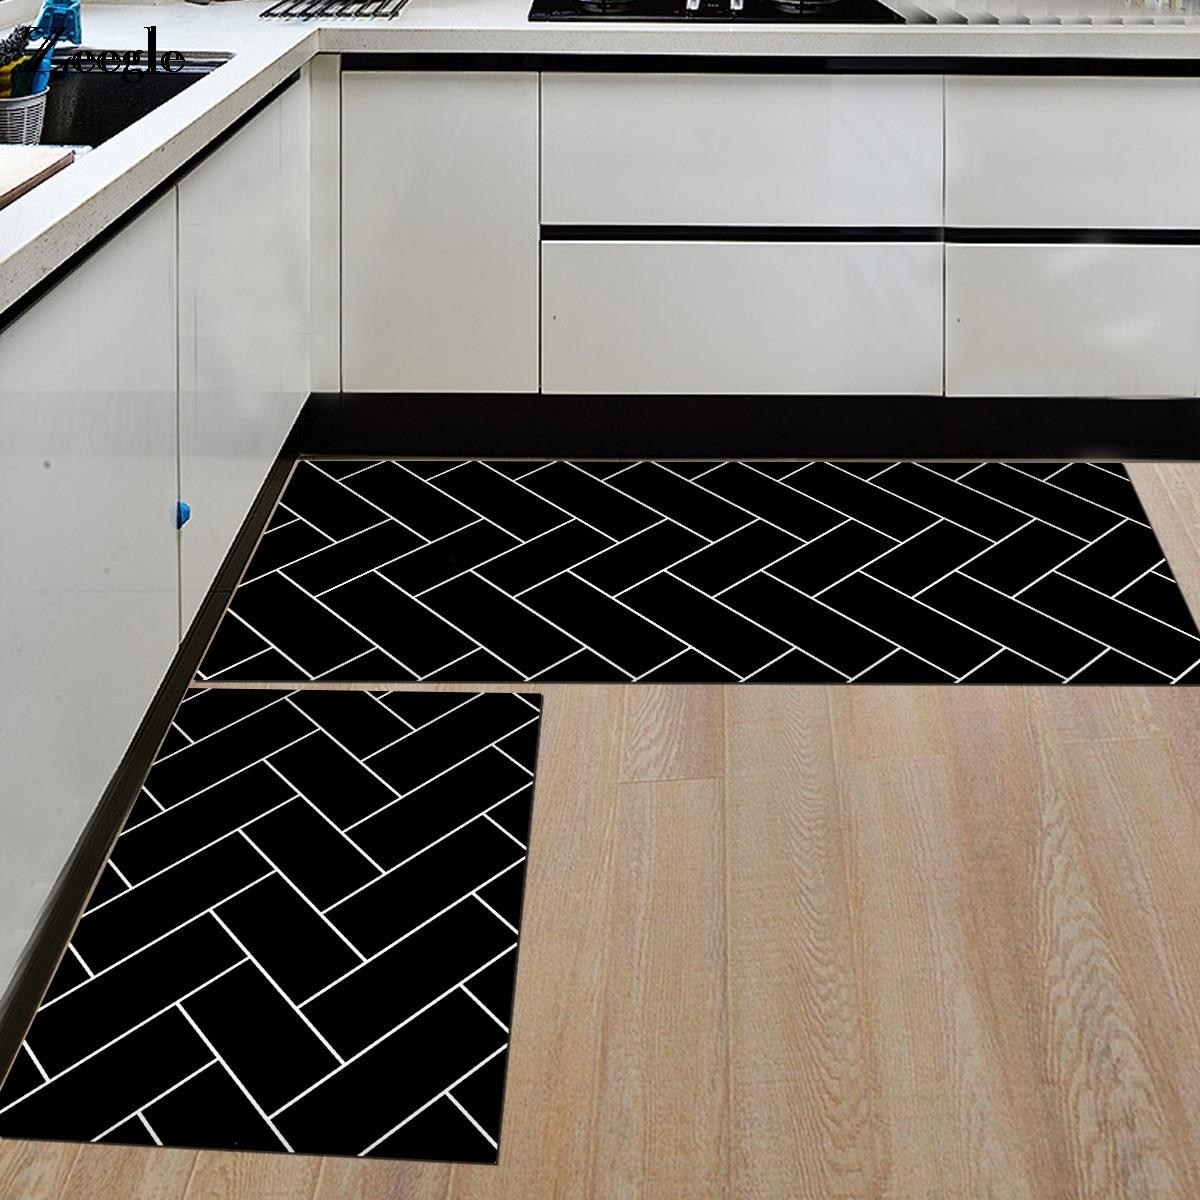 US $19.44 33% OFF|Zeegle Black And White Bricks Kitchen Rugs Non Slip  Living Room Carpet Hallway Mats Anti slip Bedroom Bedside Mats Sofa Area  Rug-in ...